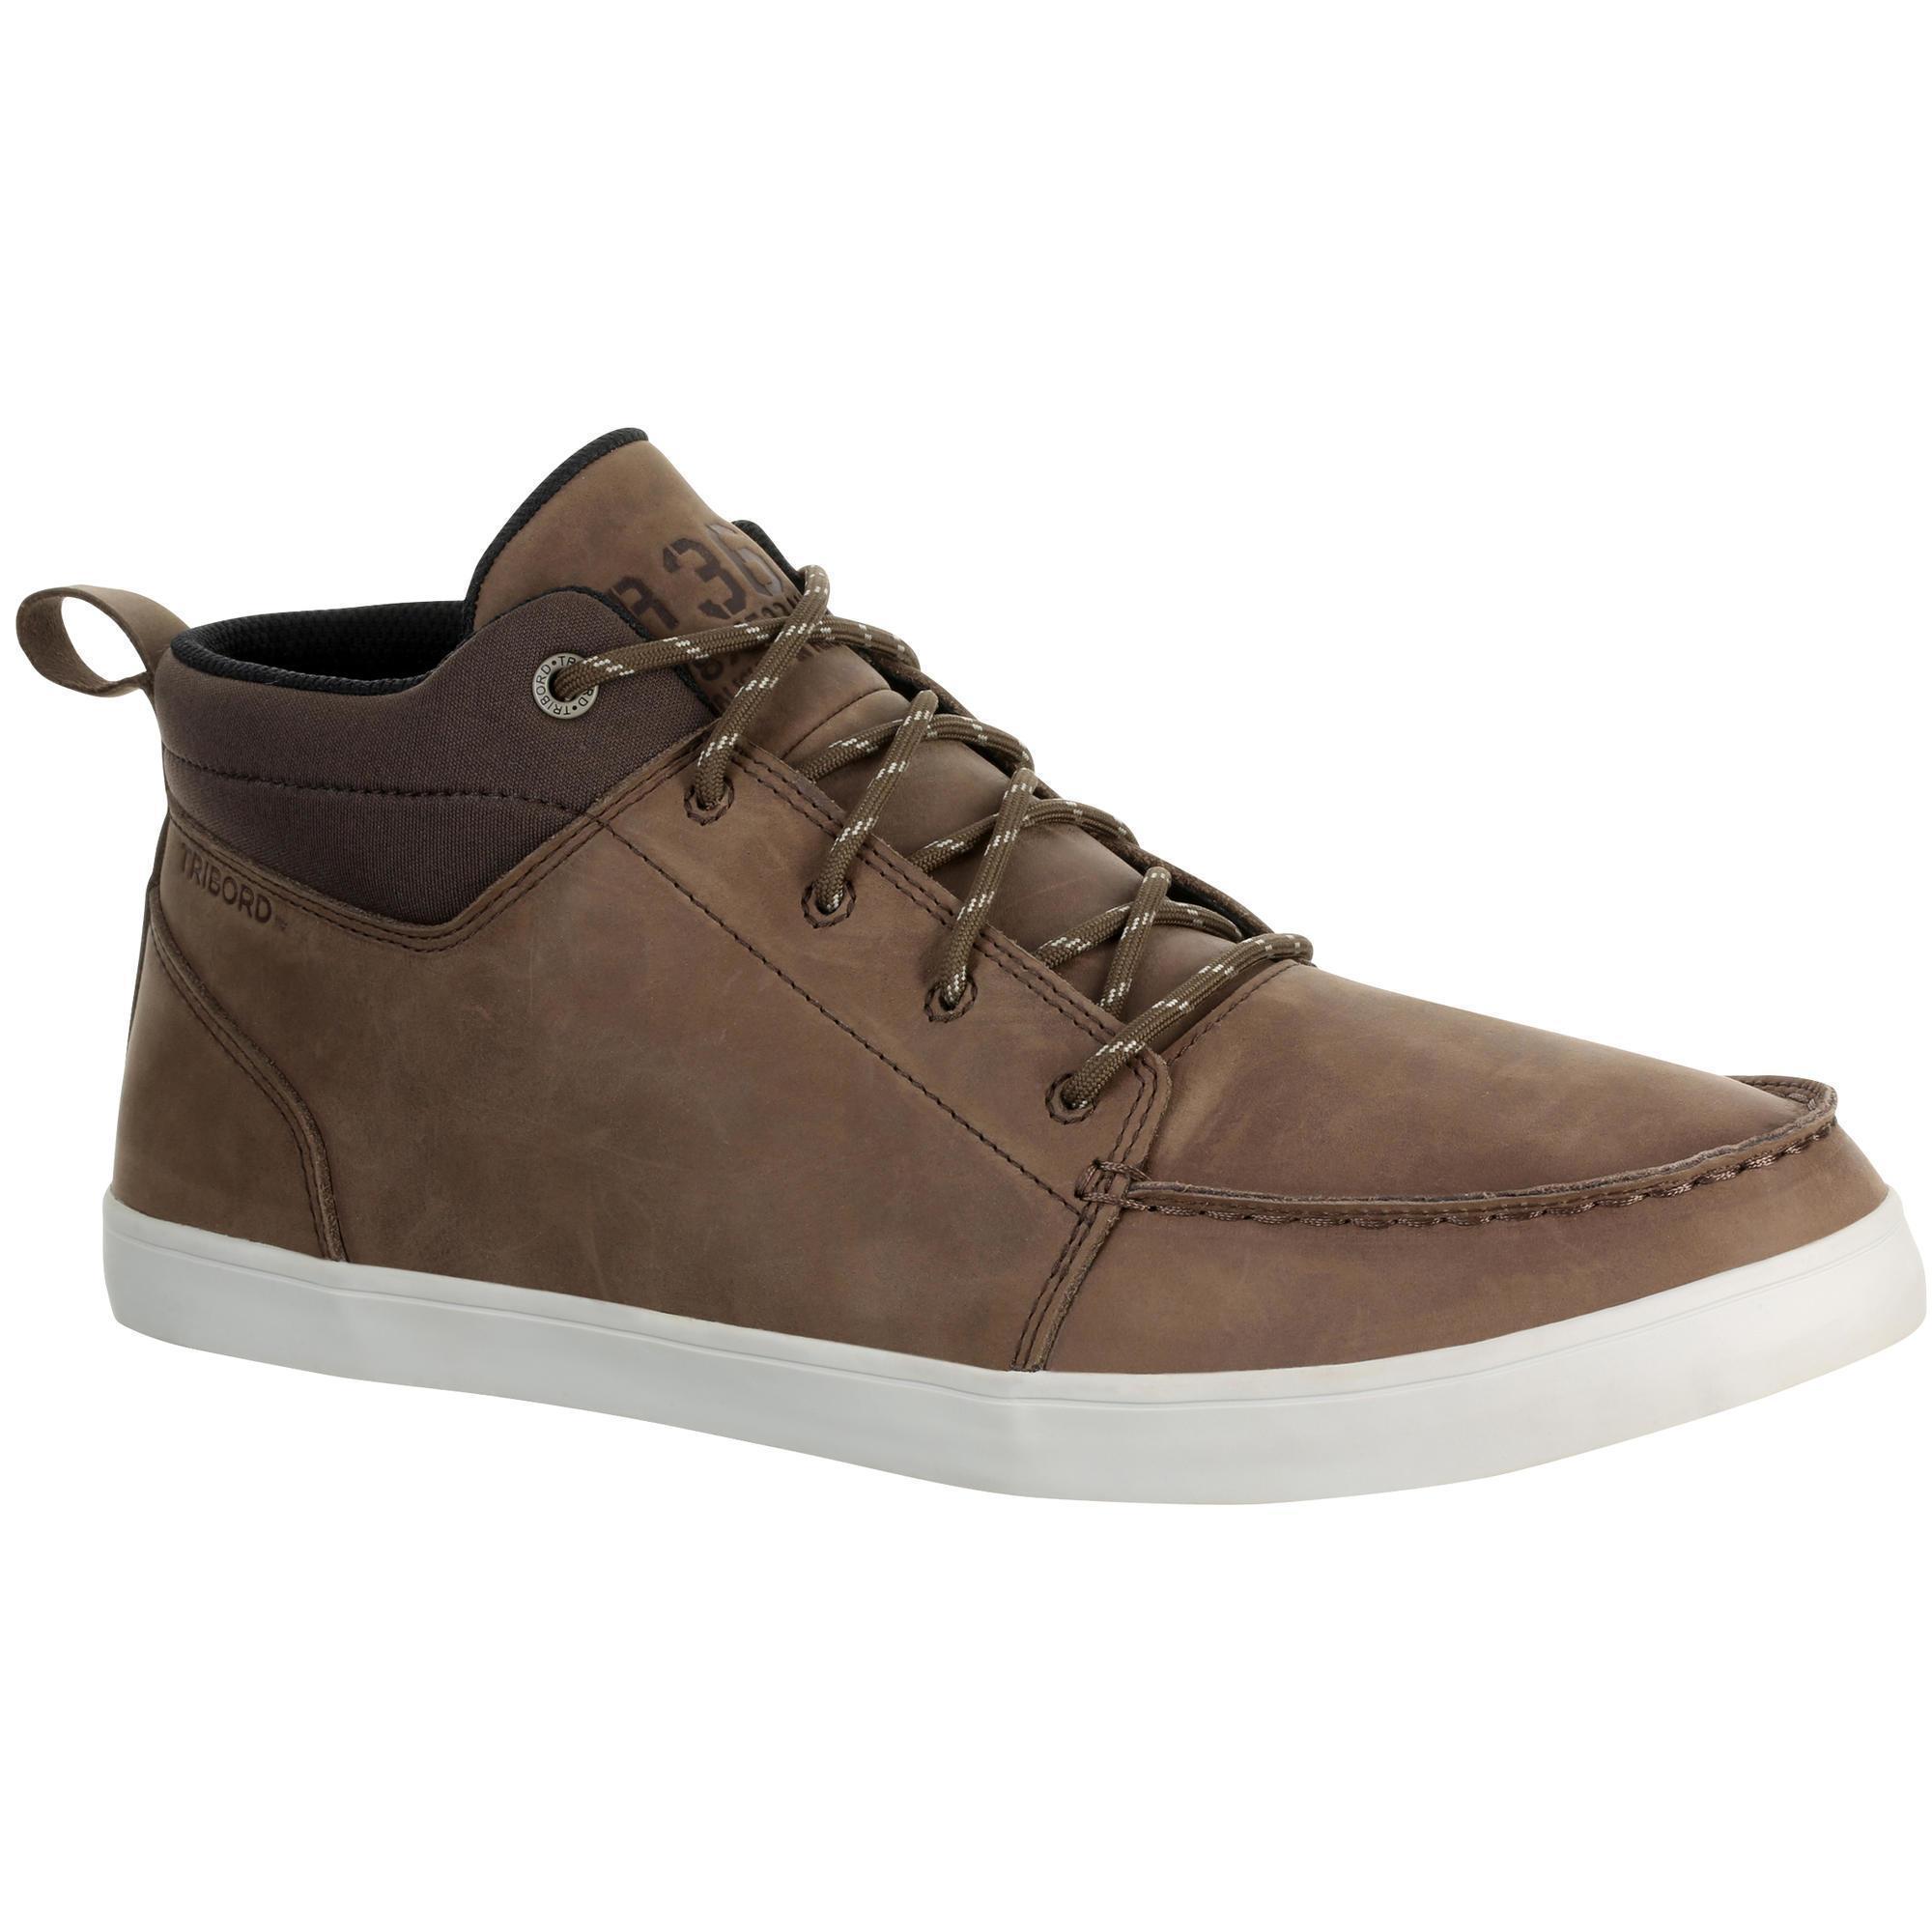 afe4ea664f8 chaussures bateau cuir homme kostalde rain marron tribordvoile 8370051 965733.jpg